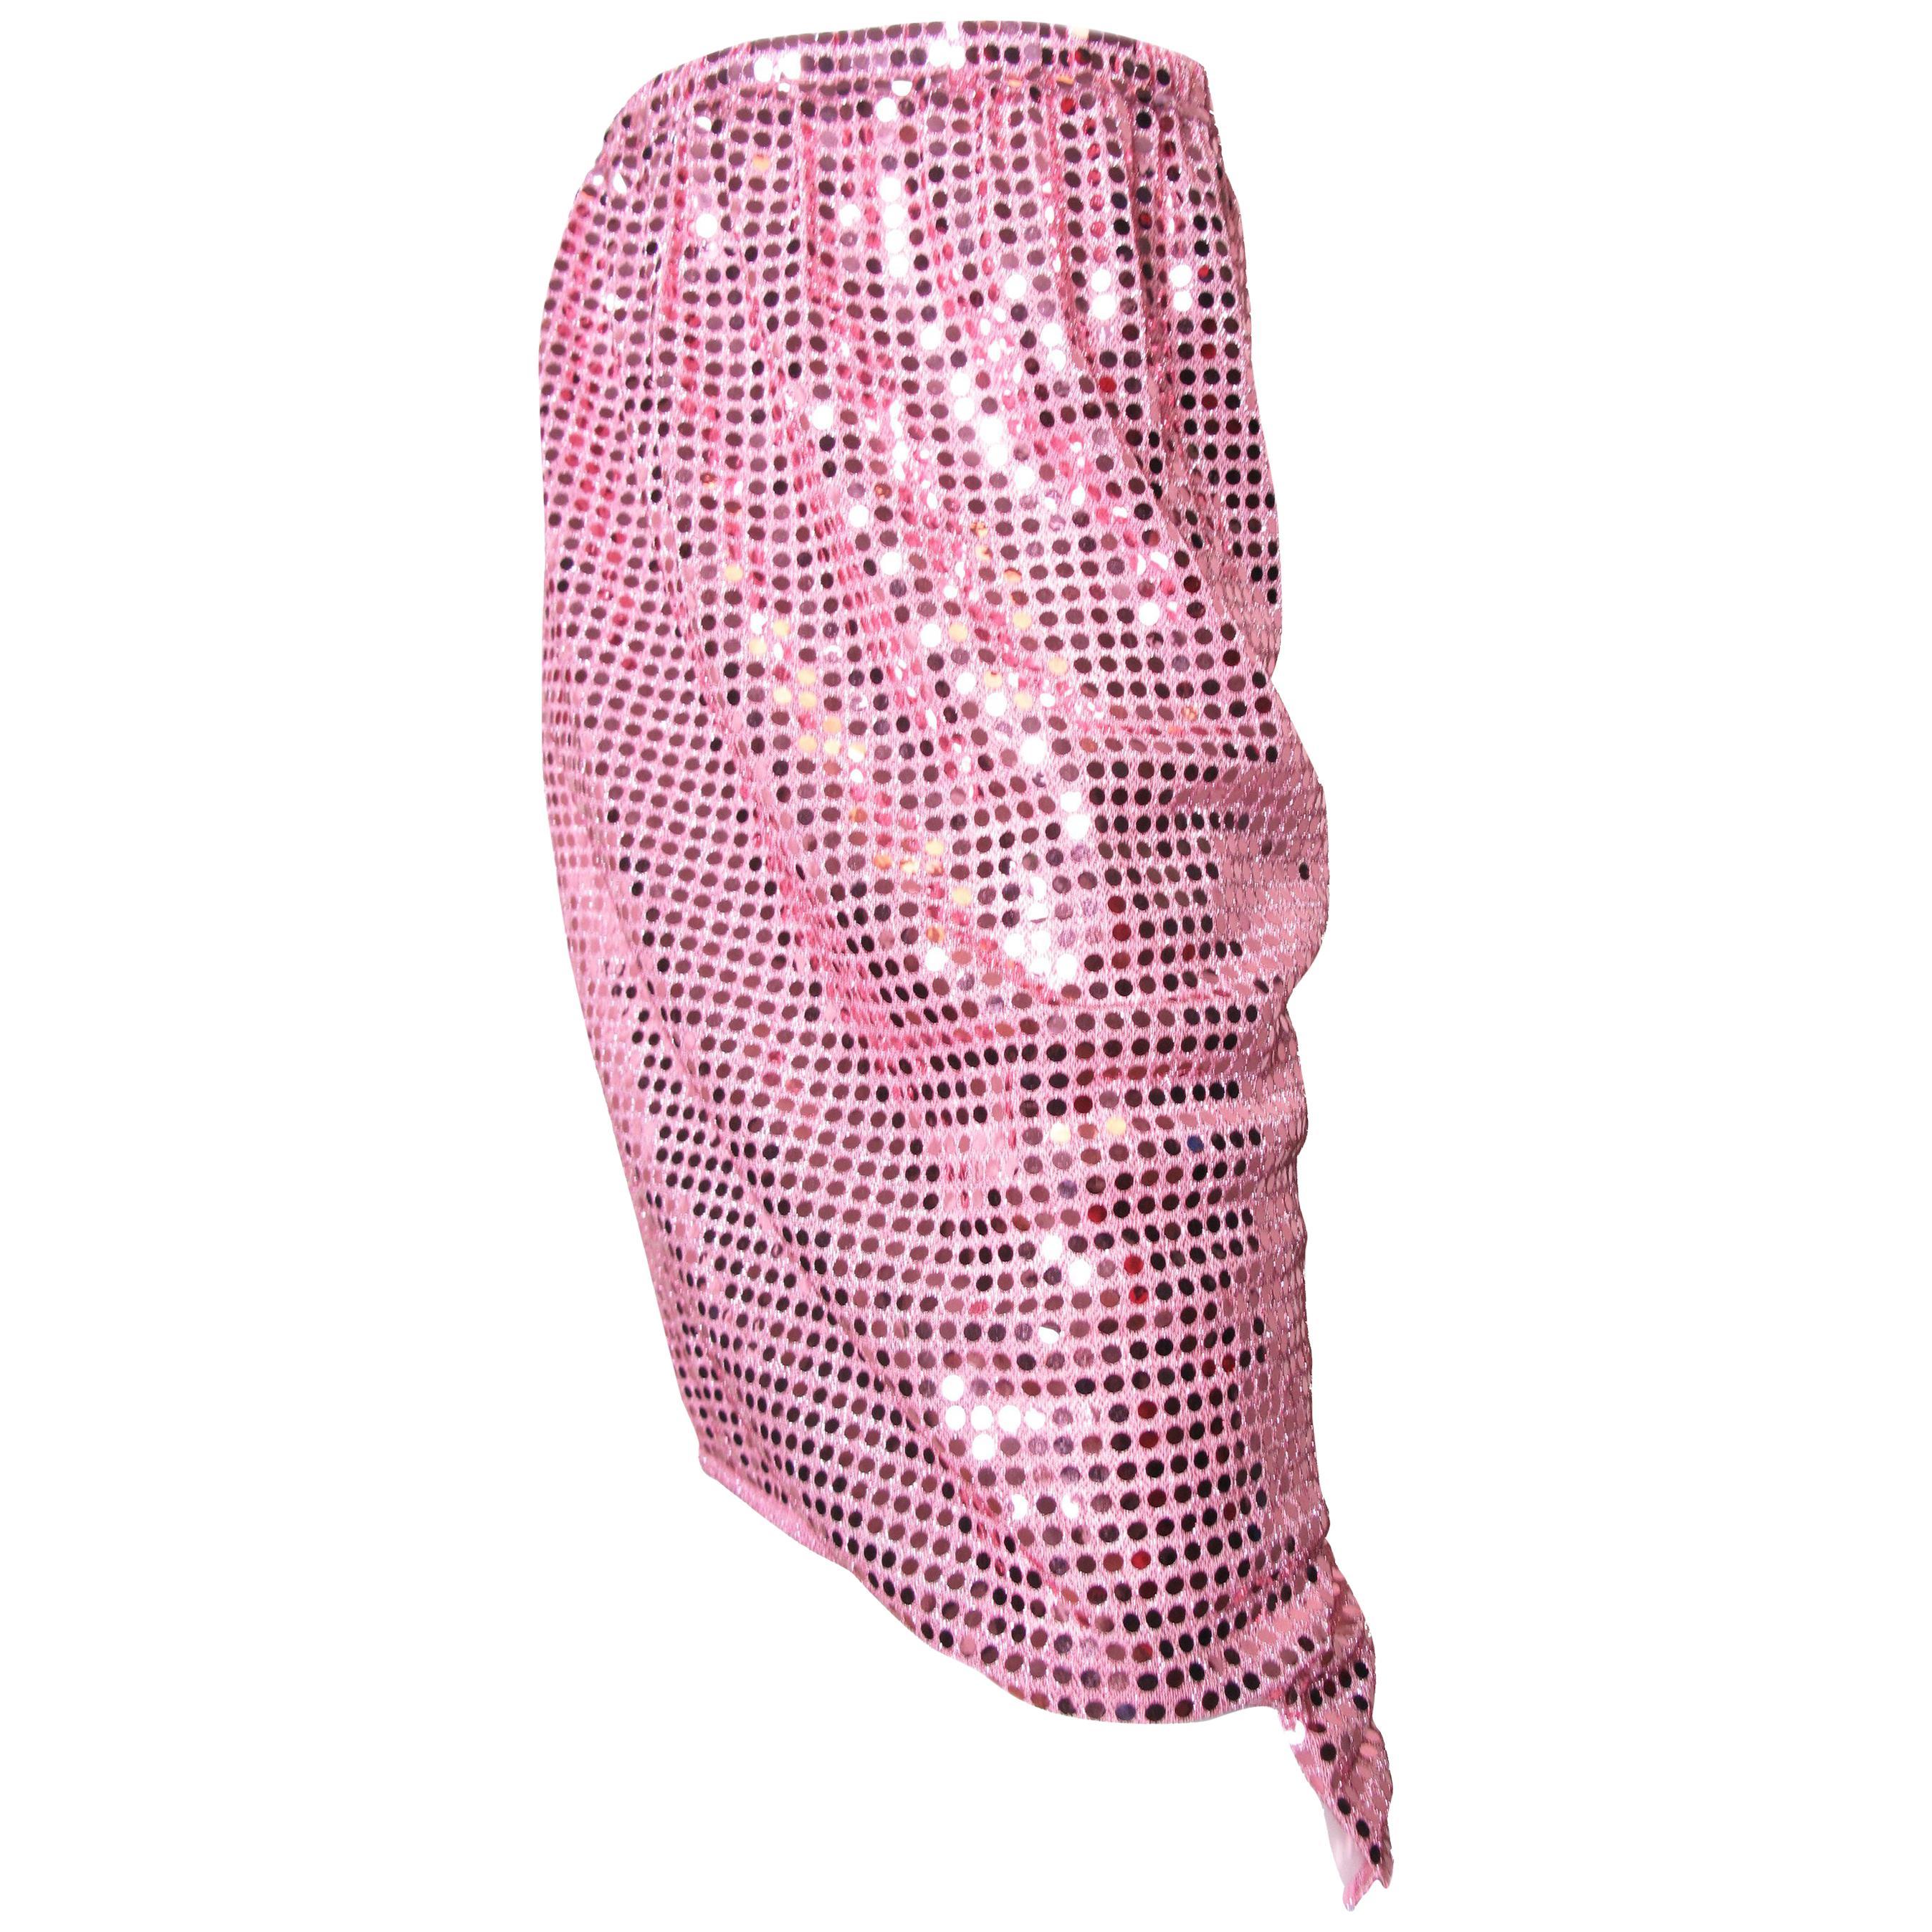 2007 Comme des Garcons pink sequin skirt elastic waist